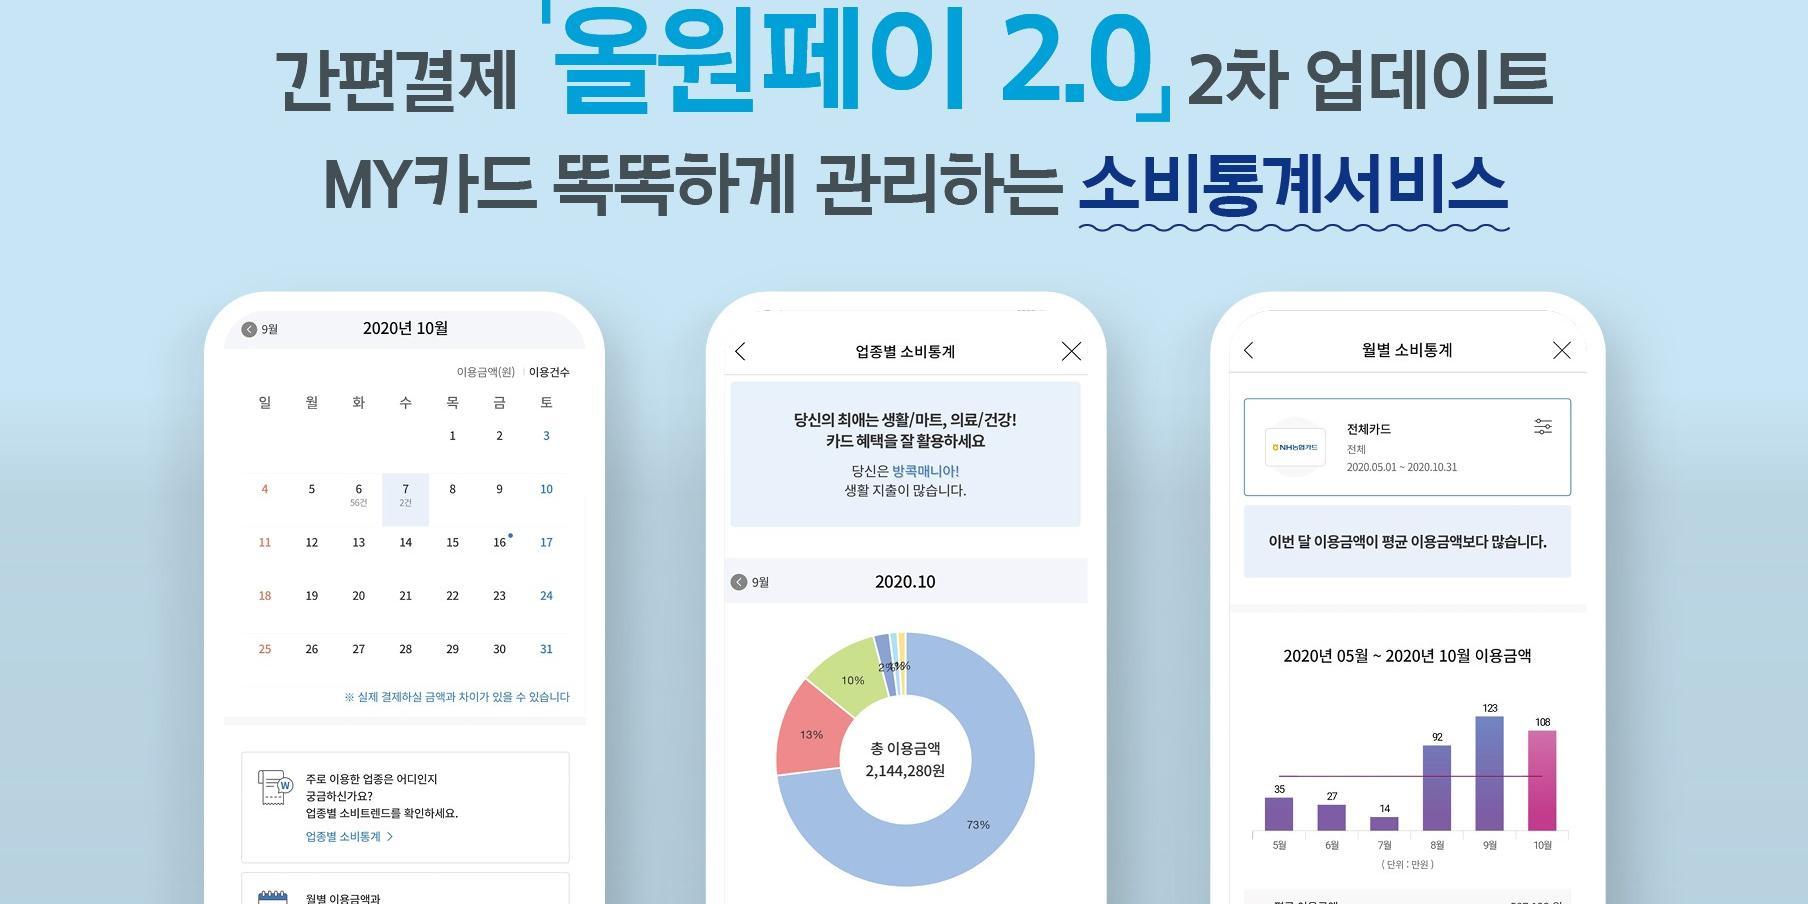 """NH농협카드, 올원페이 업데이트하고 소비통계서비스 추가"